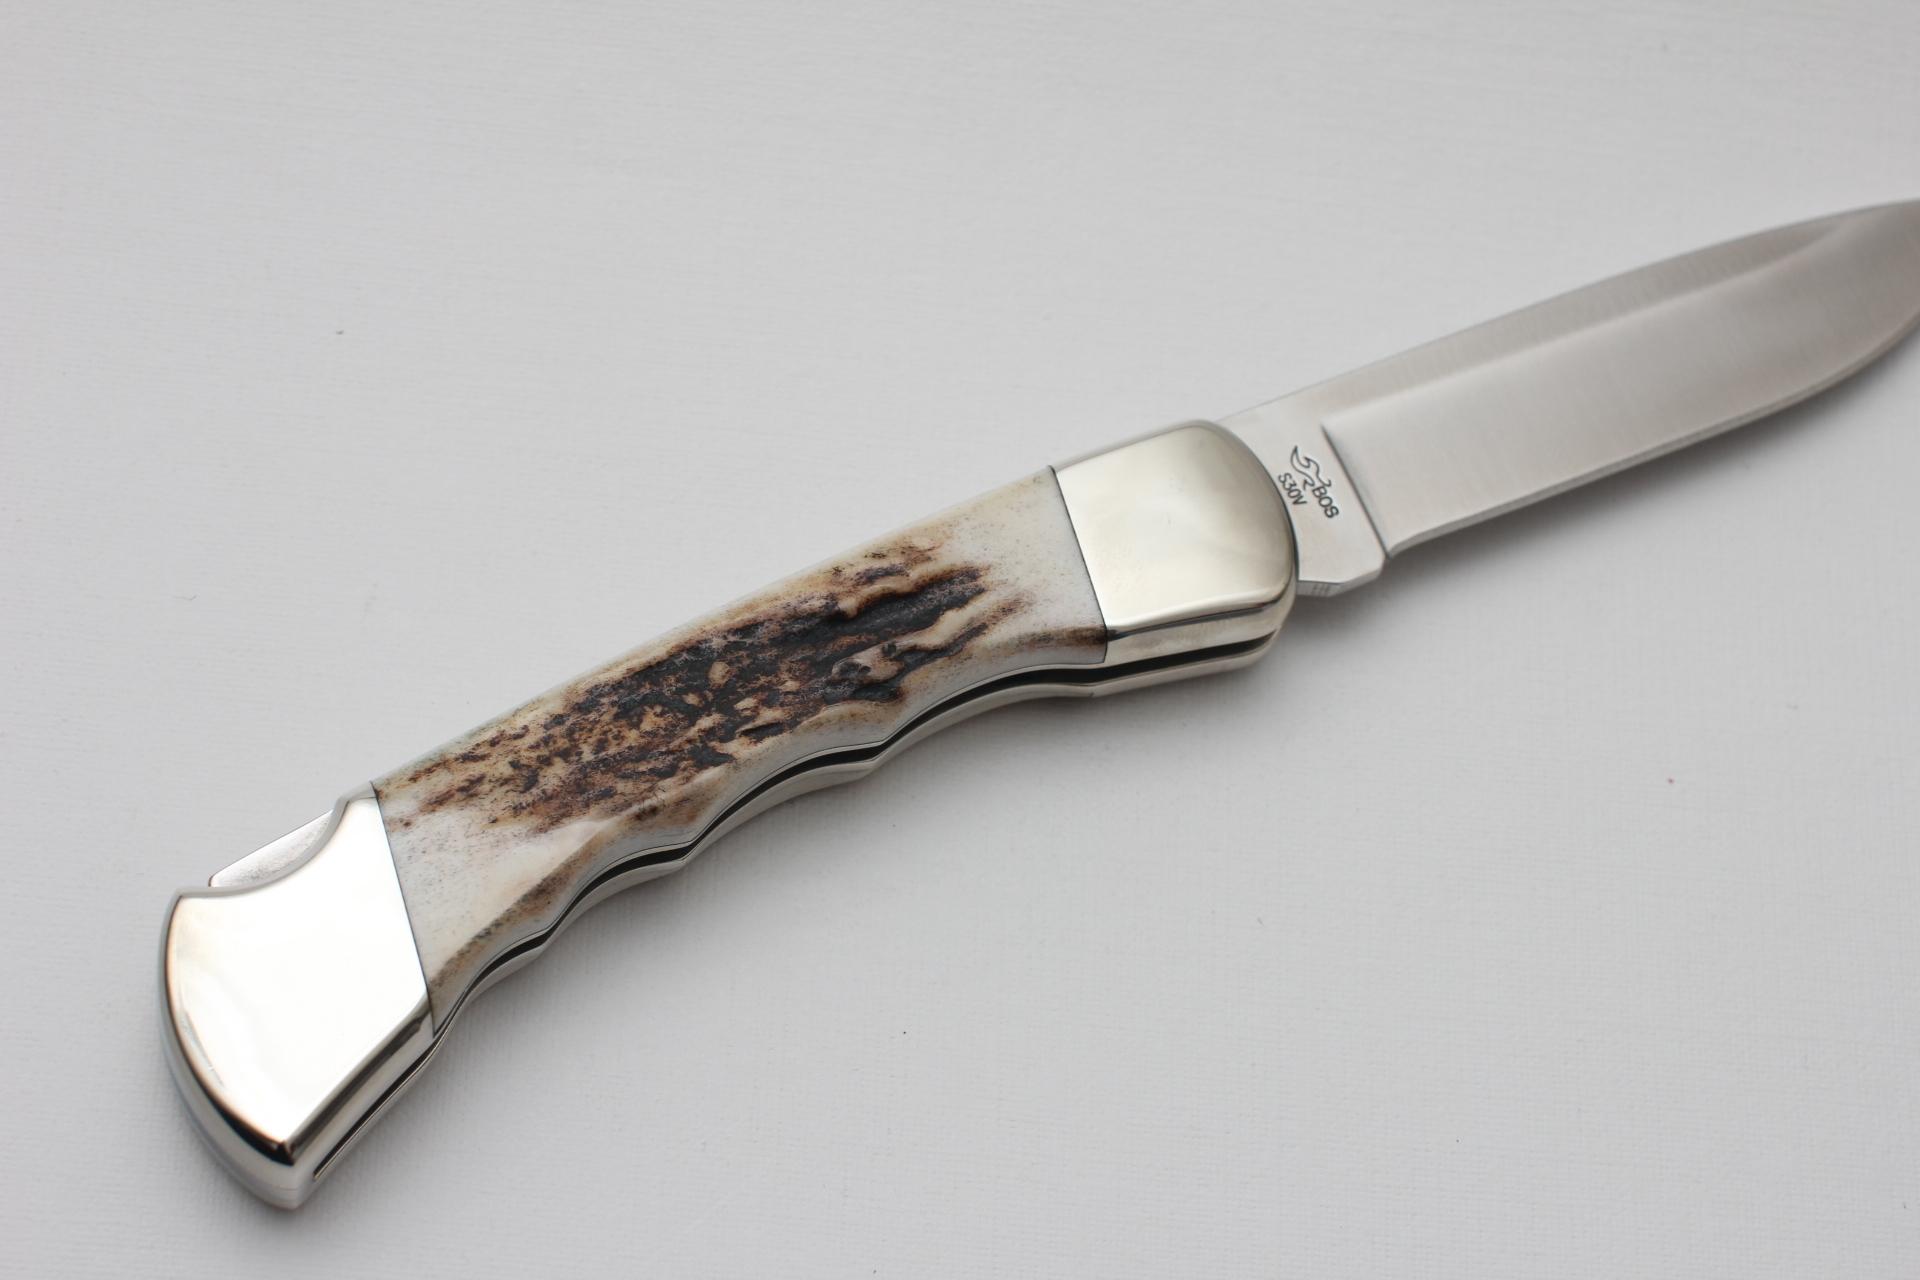 Нож BUCK Folding Hunter 110 S30V custom - фотография